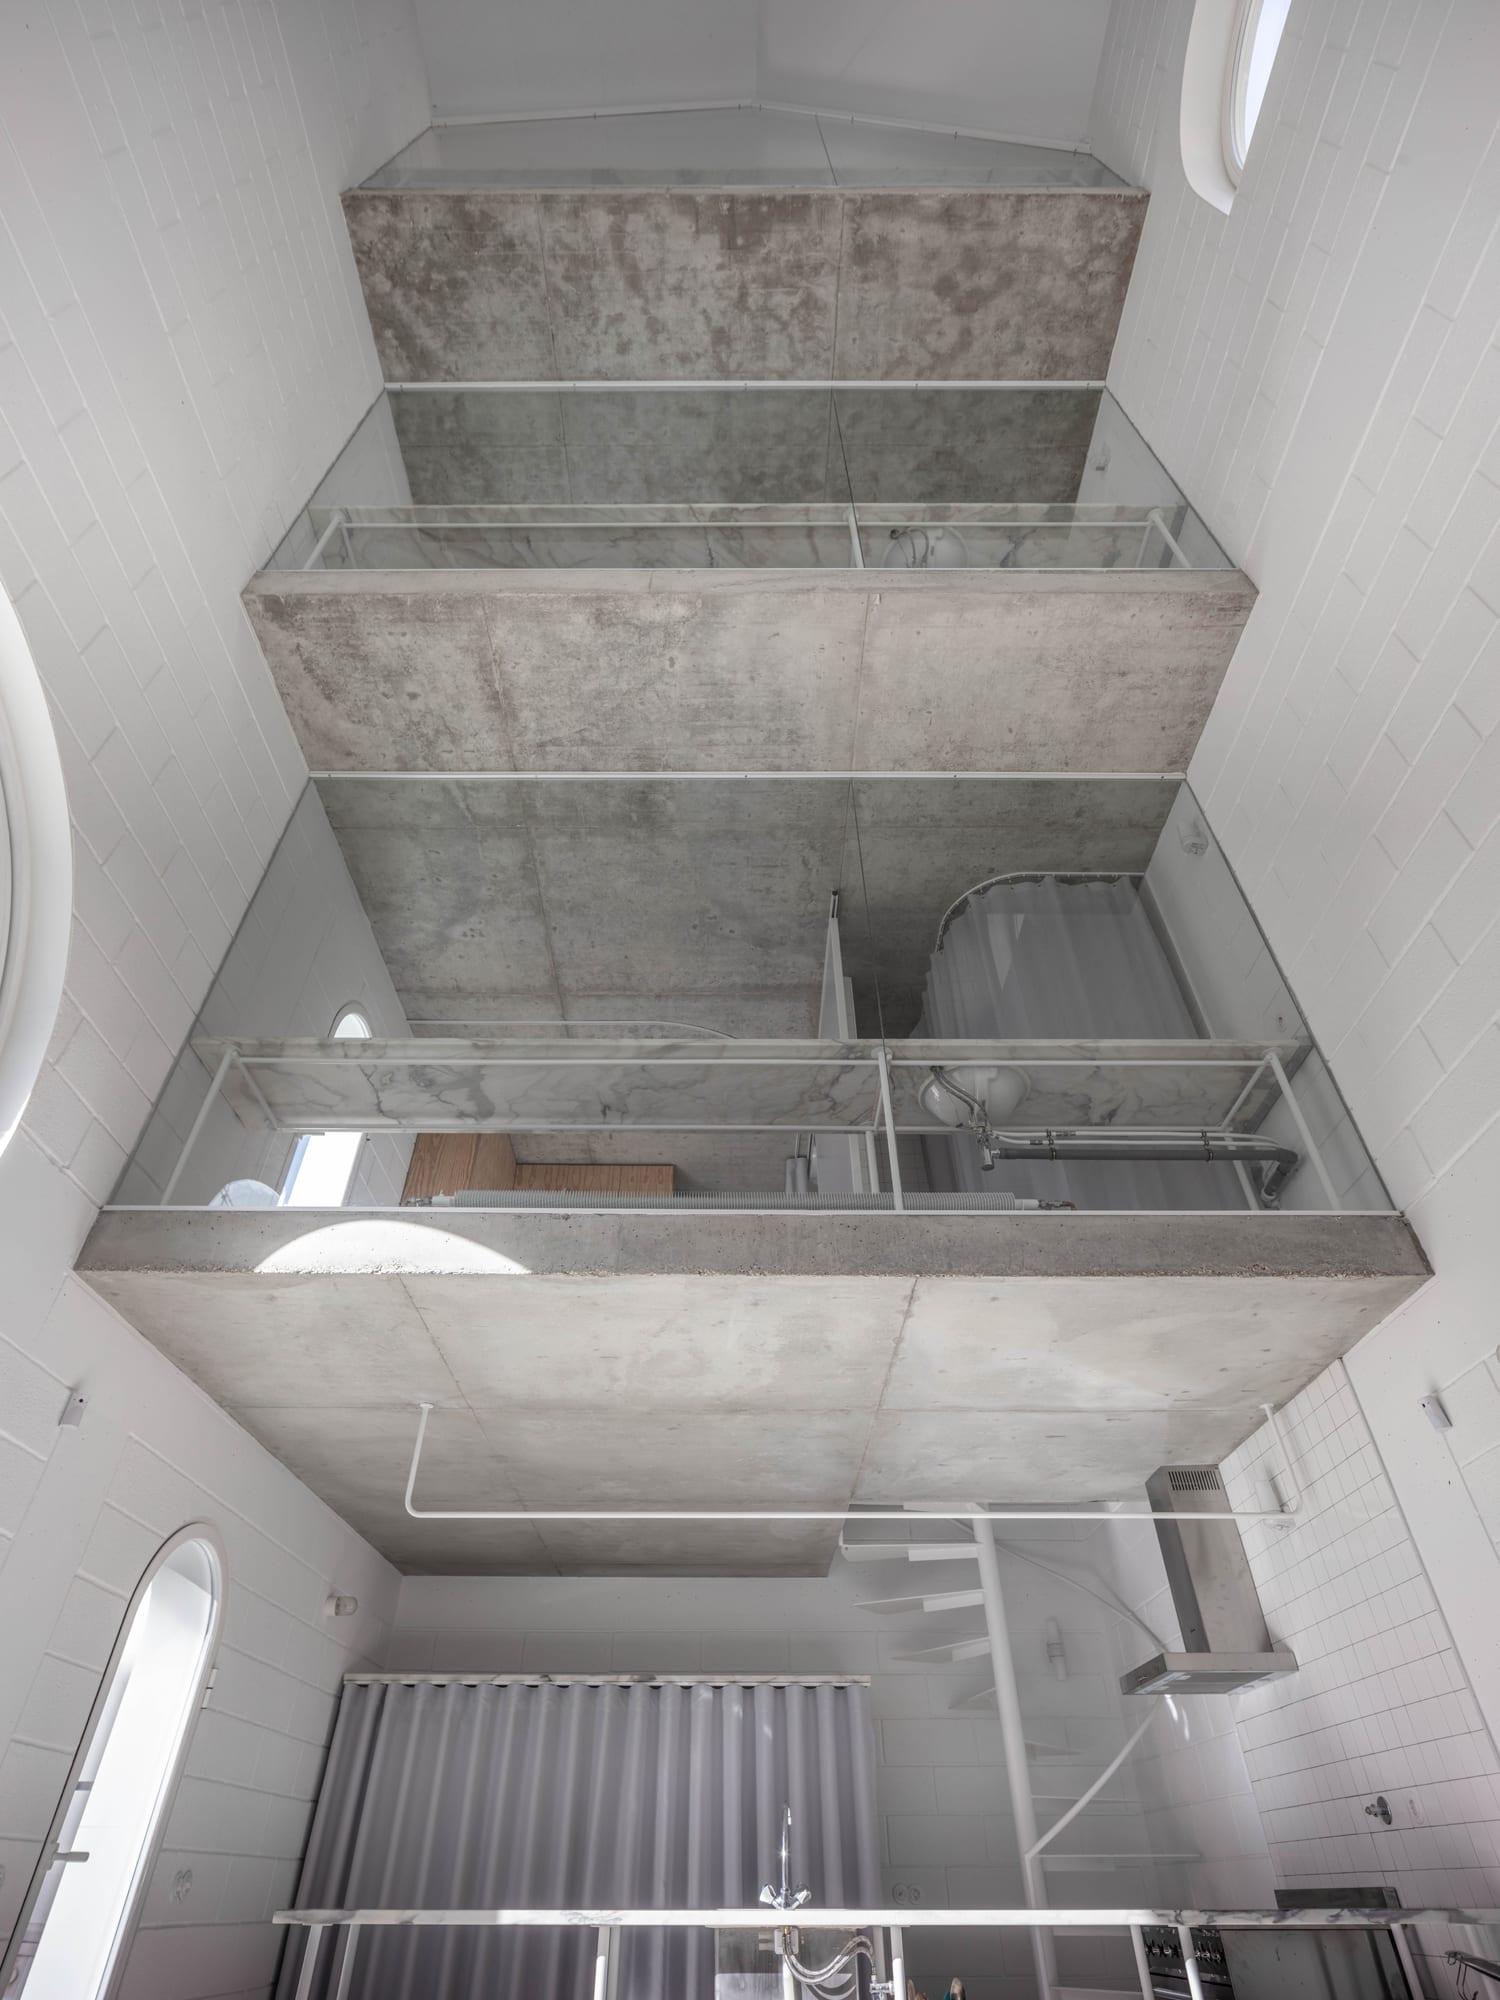 Dodged House In Lisbon By Leopold Banchini Daniel Zamarbide Yellowtrace 09